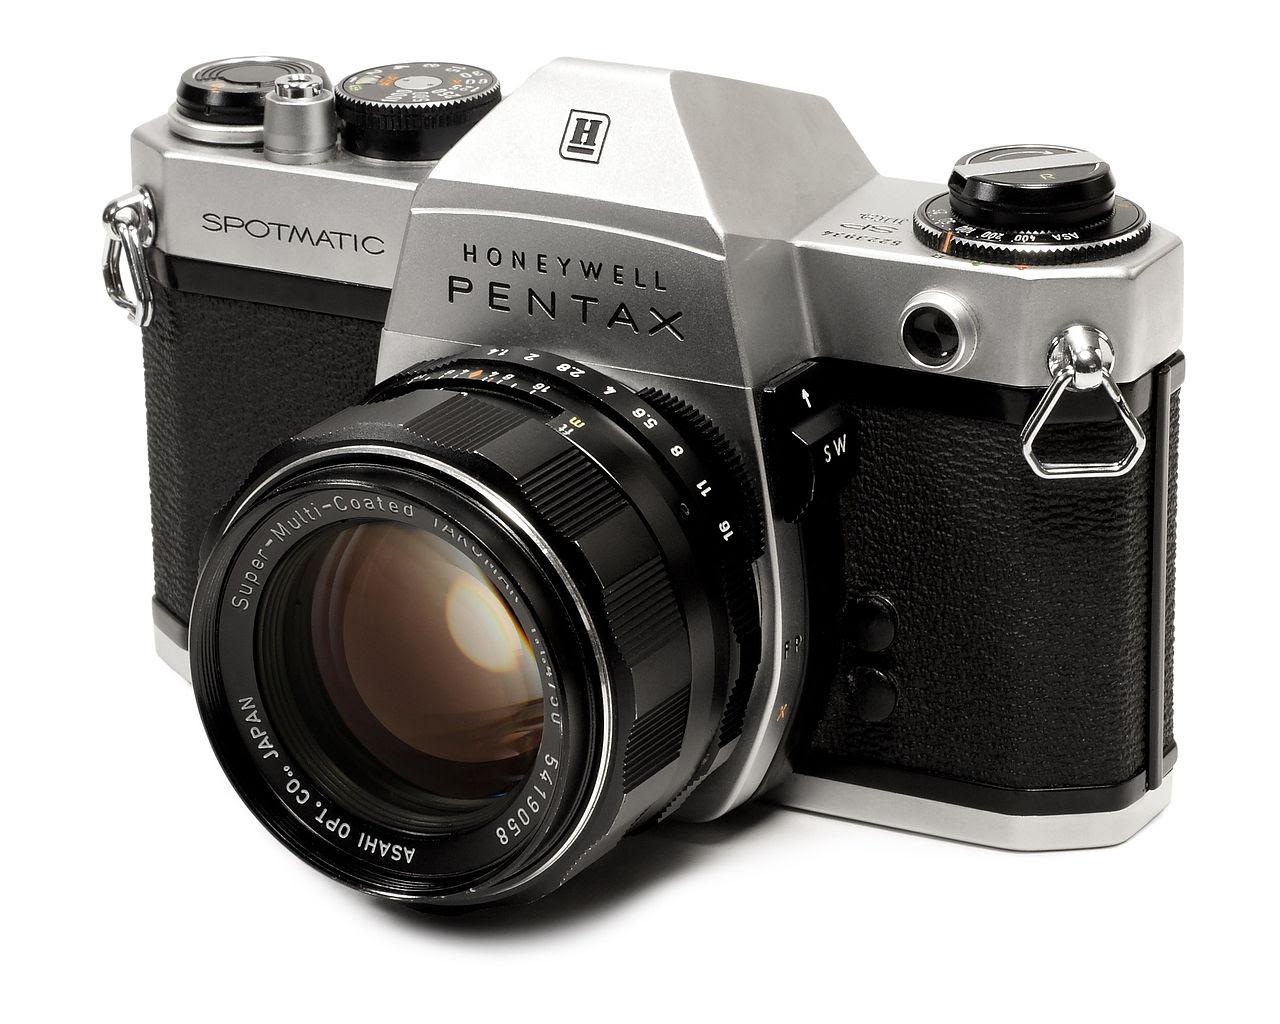 Pentax Spotmatic con Lente 50 mm f/1.4